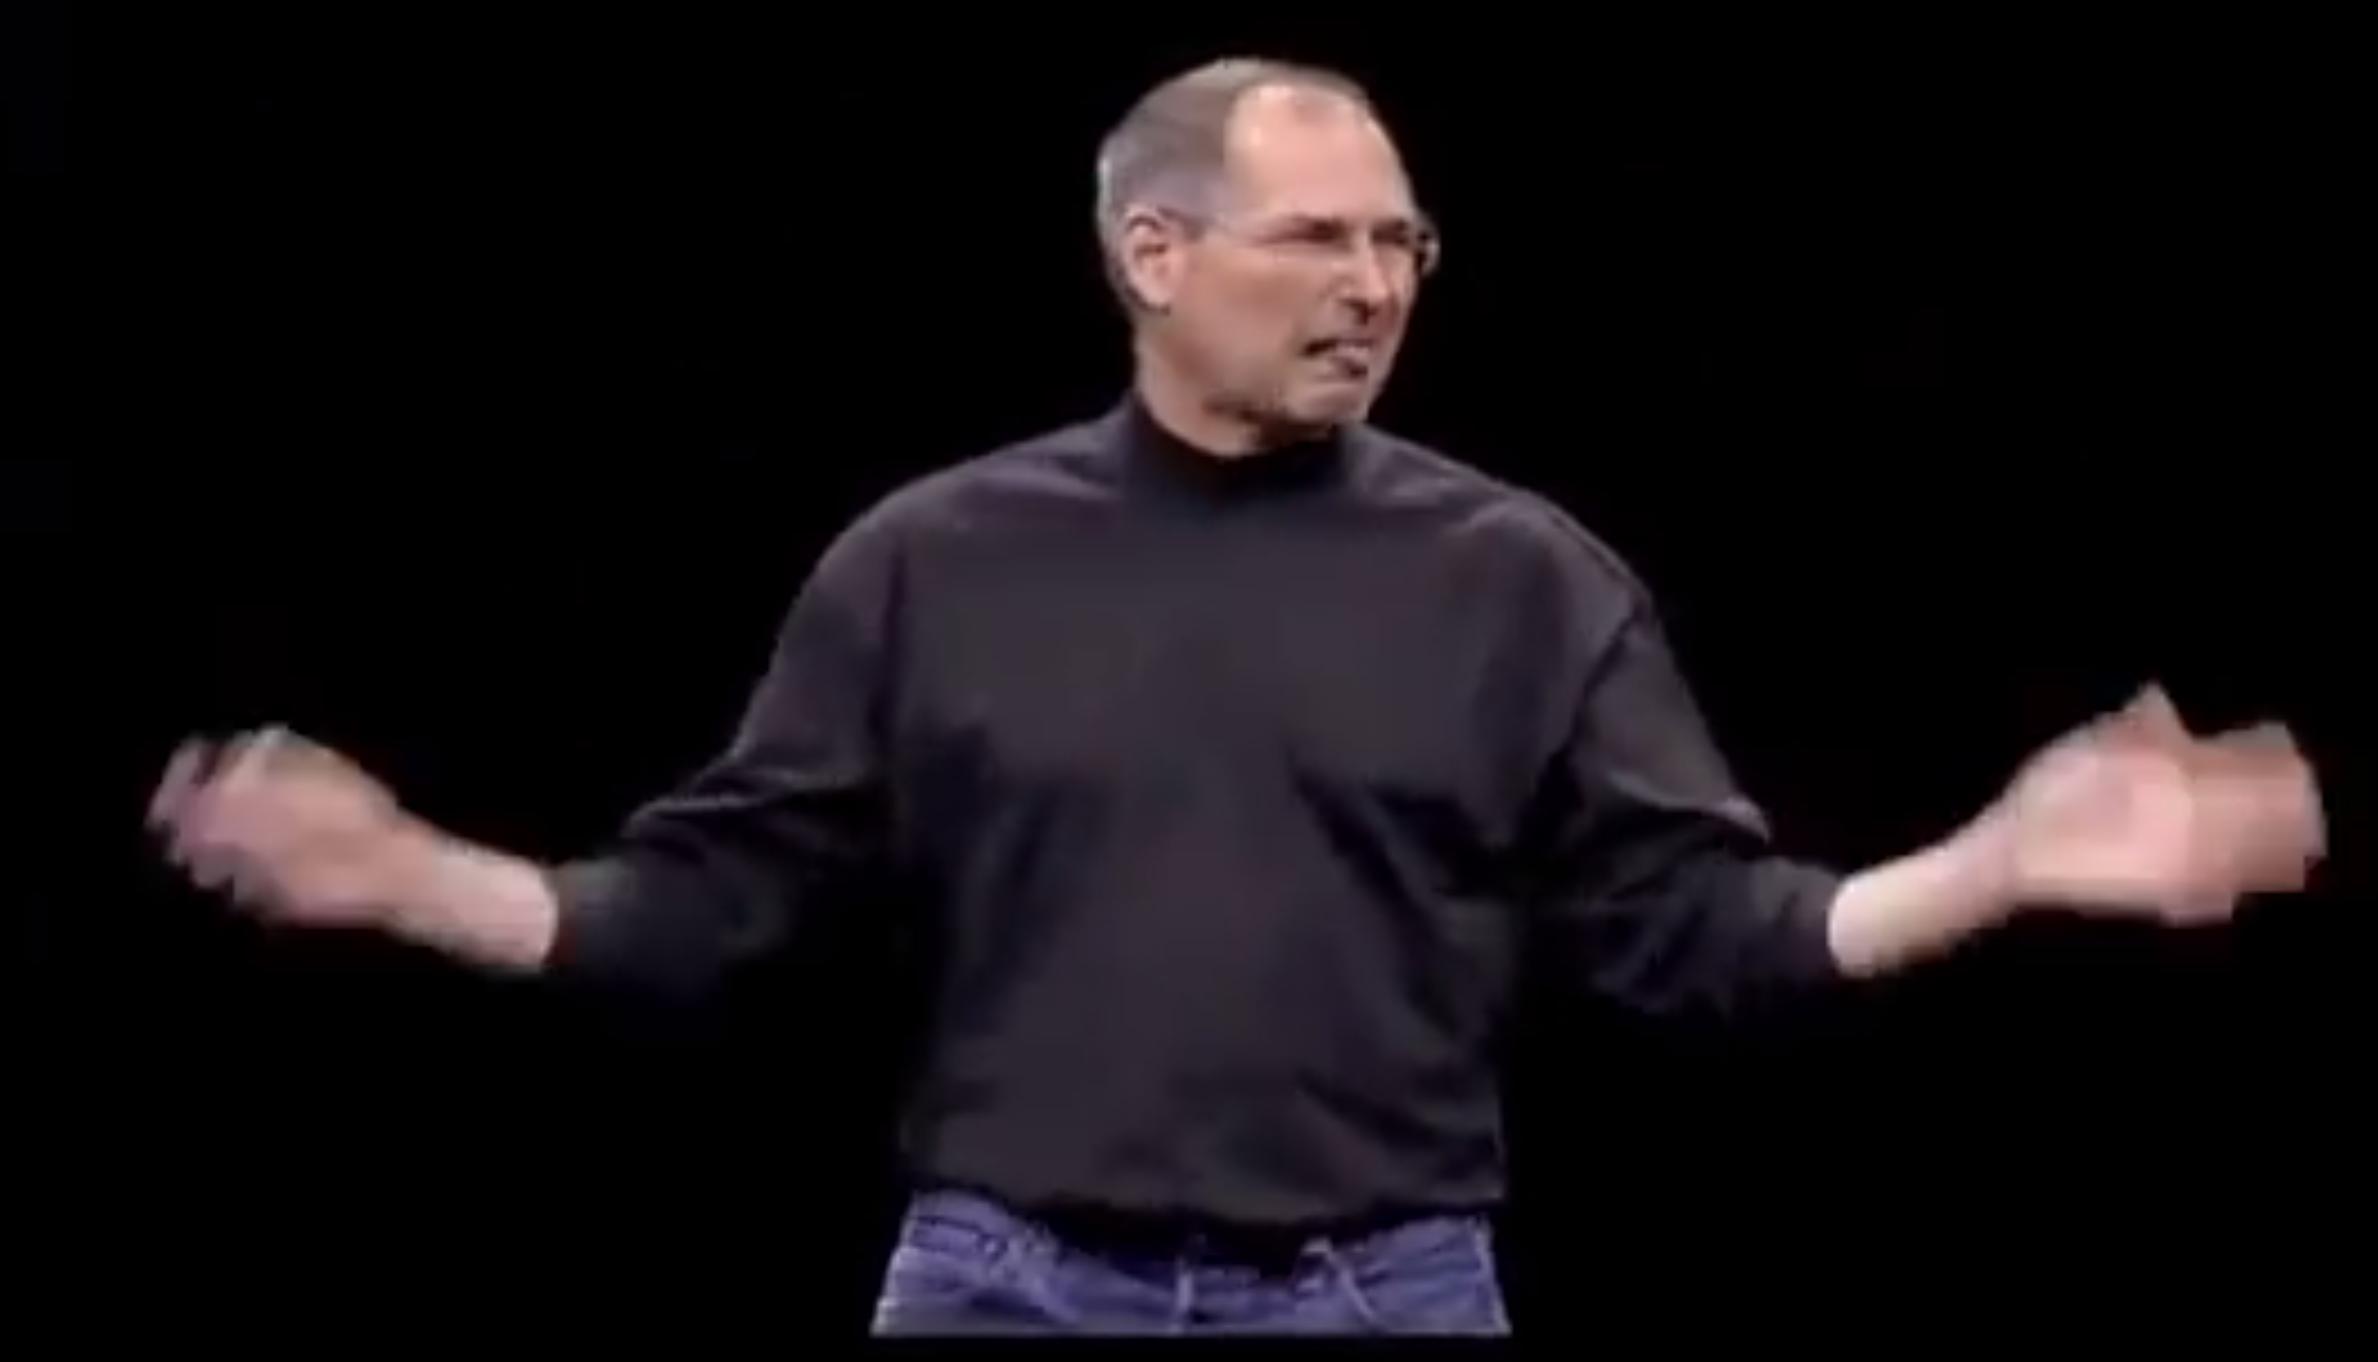 Steve Jobs hates stylus